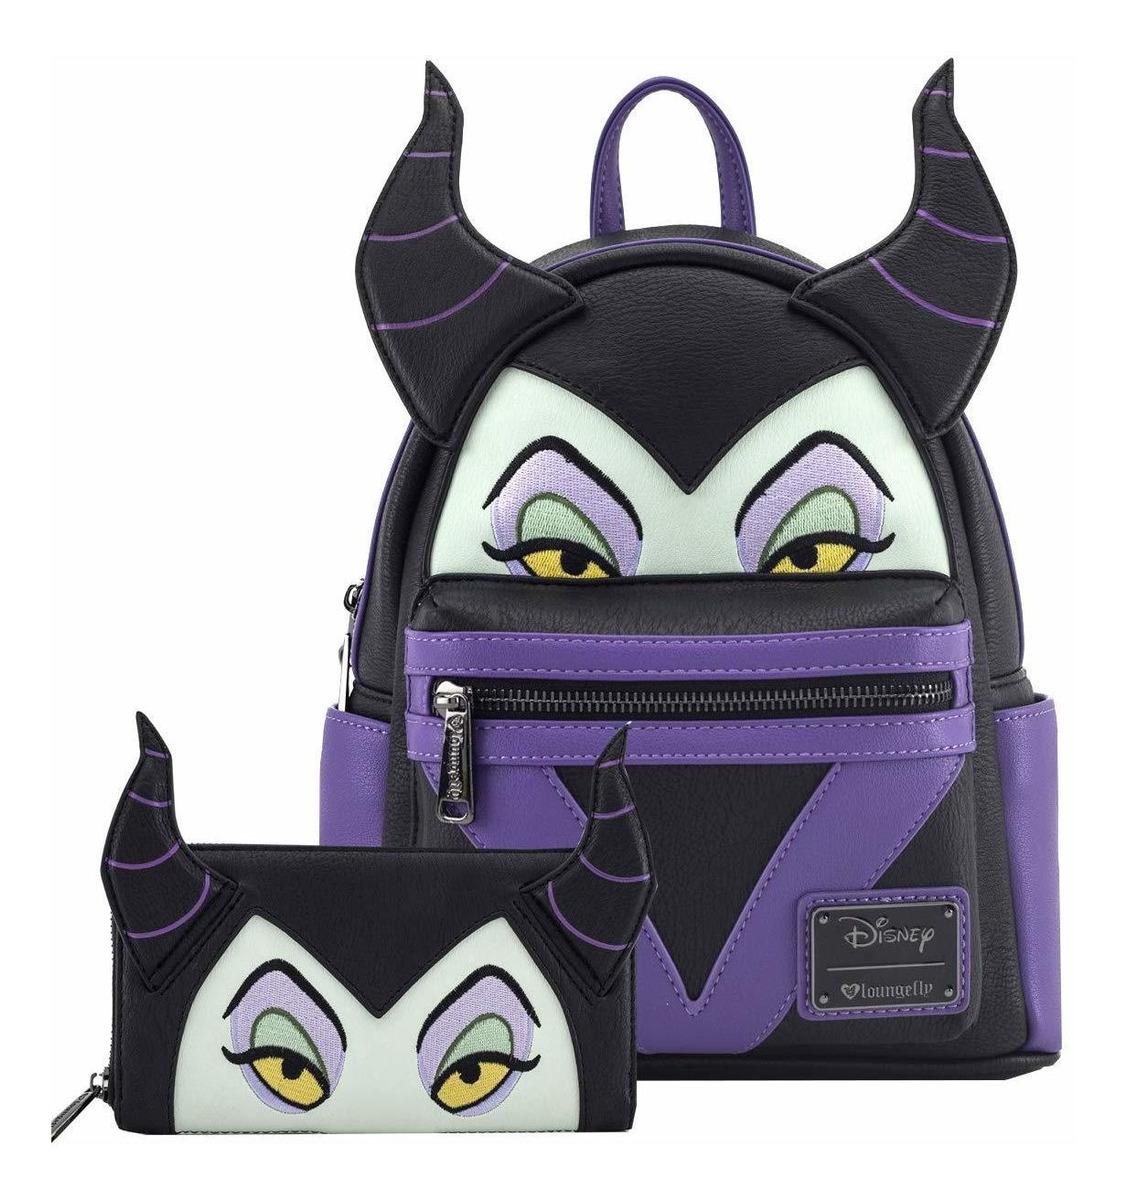 Loungefly Mini Mochila Y Cartera De Disney Maleficent D